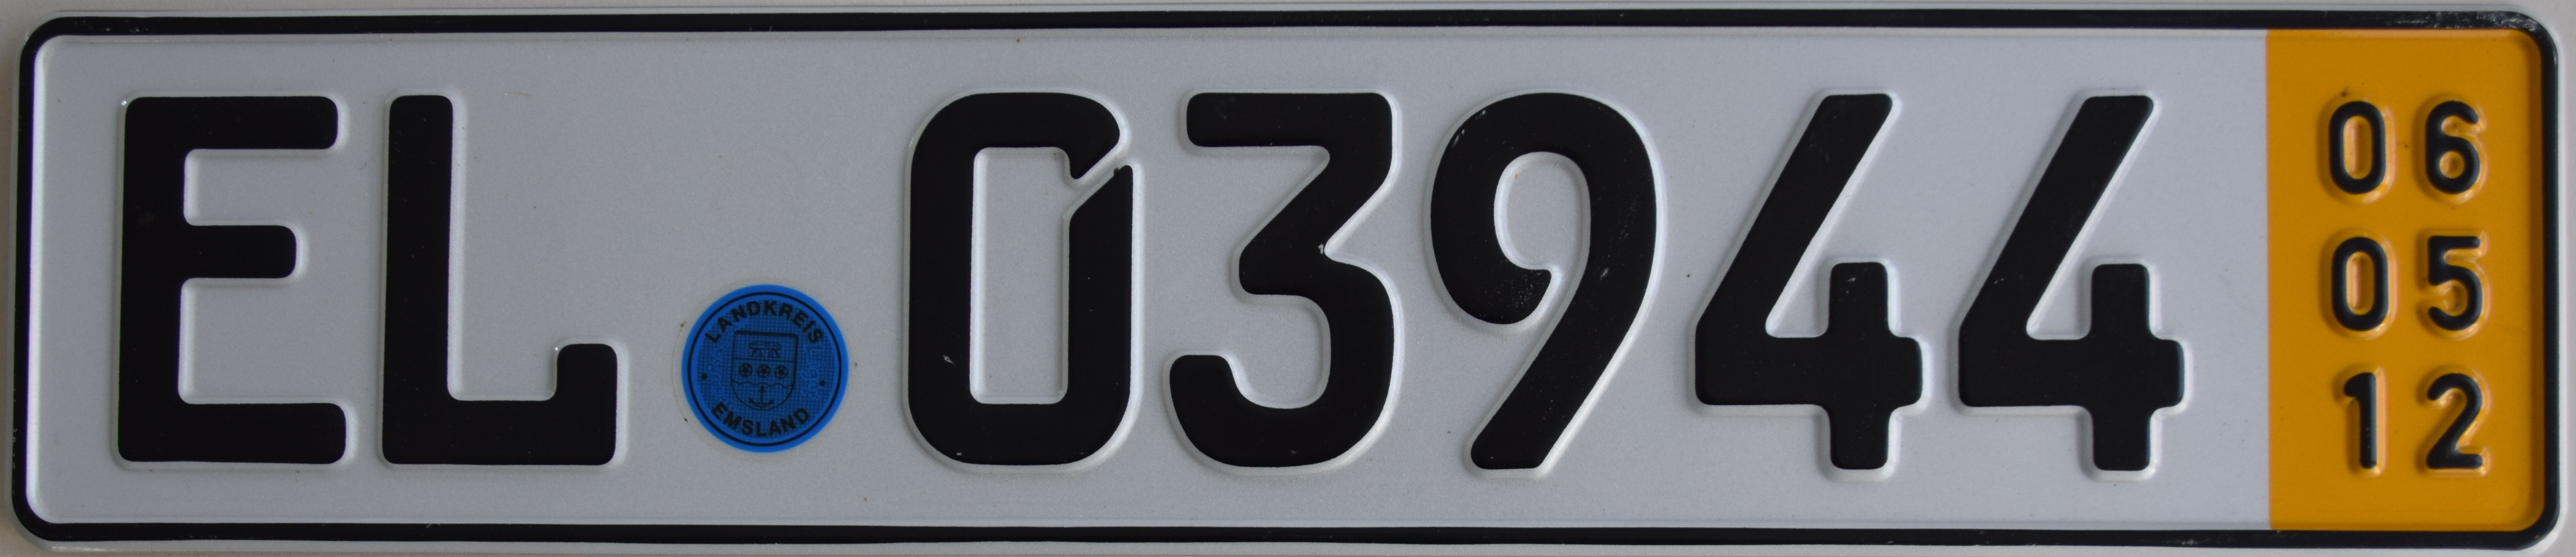 File Temporary German License Plate Emsland Jpg Wikimedia Commons